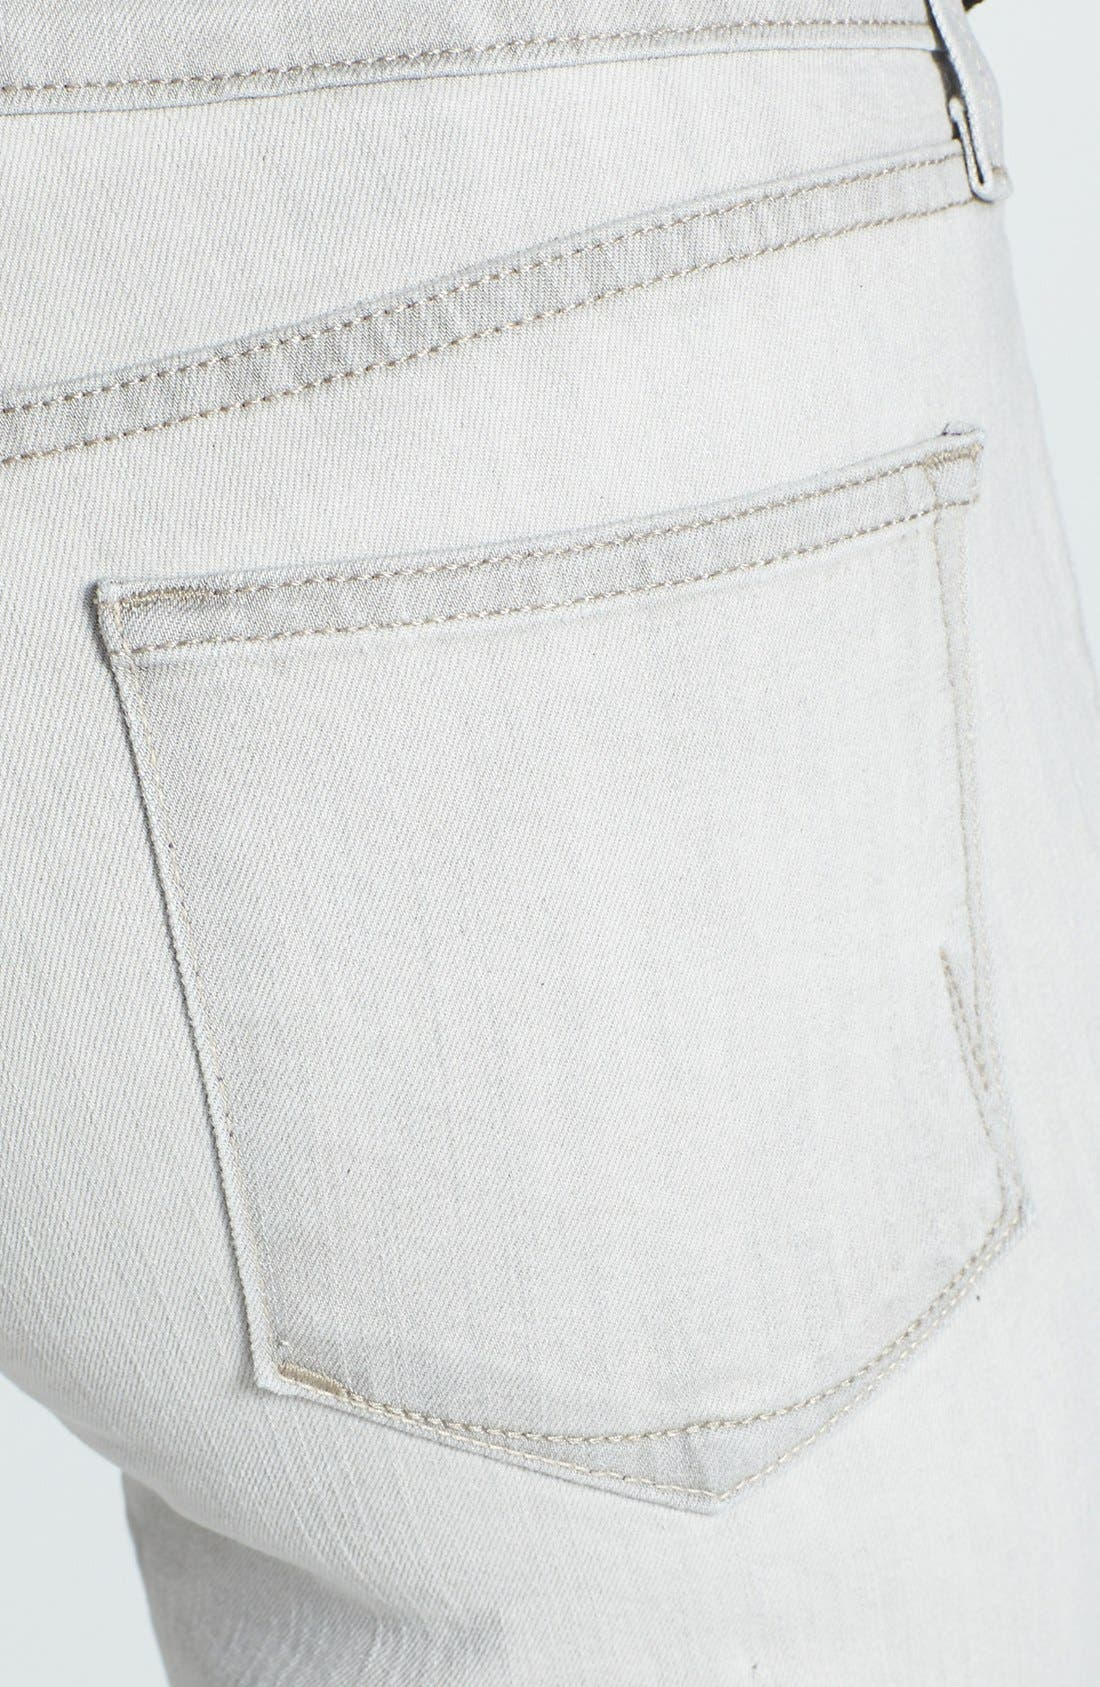 Alternate Image 3  - NYDJ 'Clarissa' Fitted Stretch Ankle Skinny Jeans (Salt Spring)